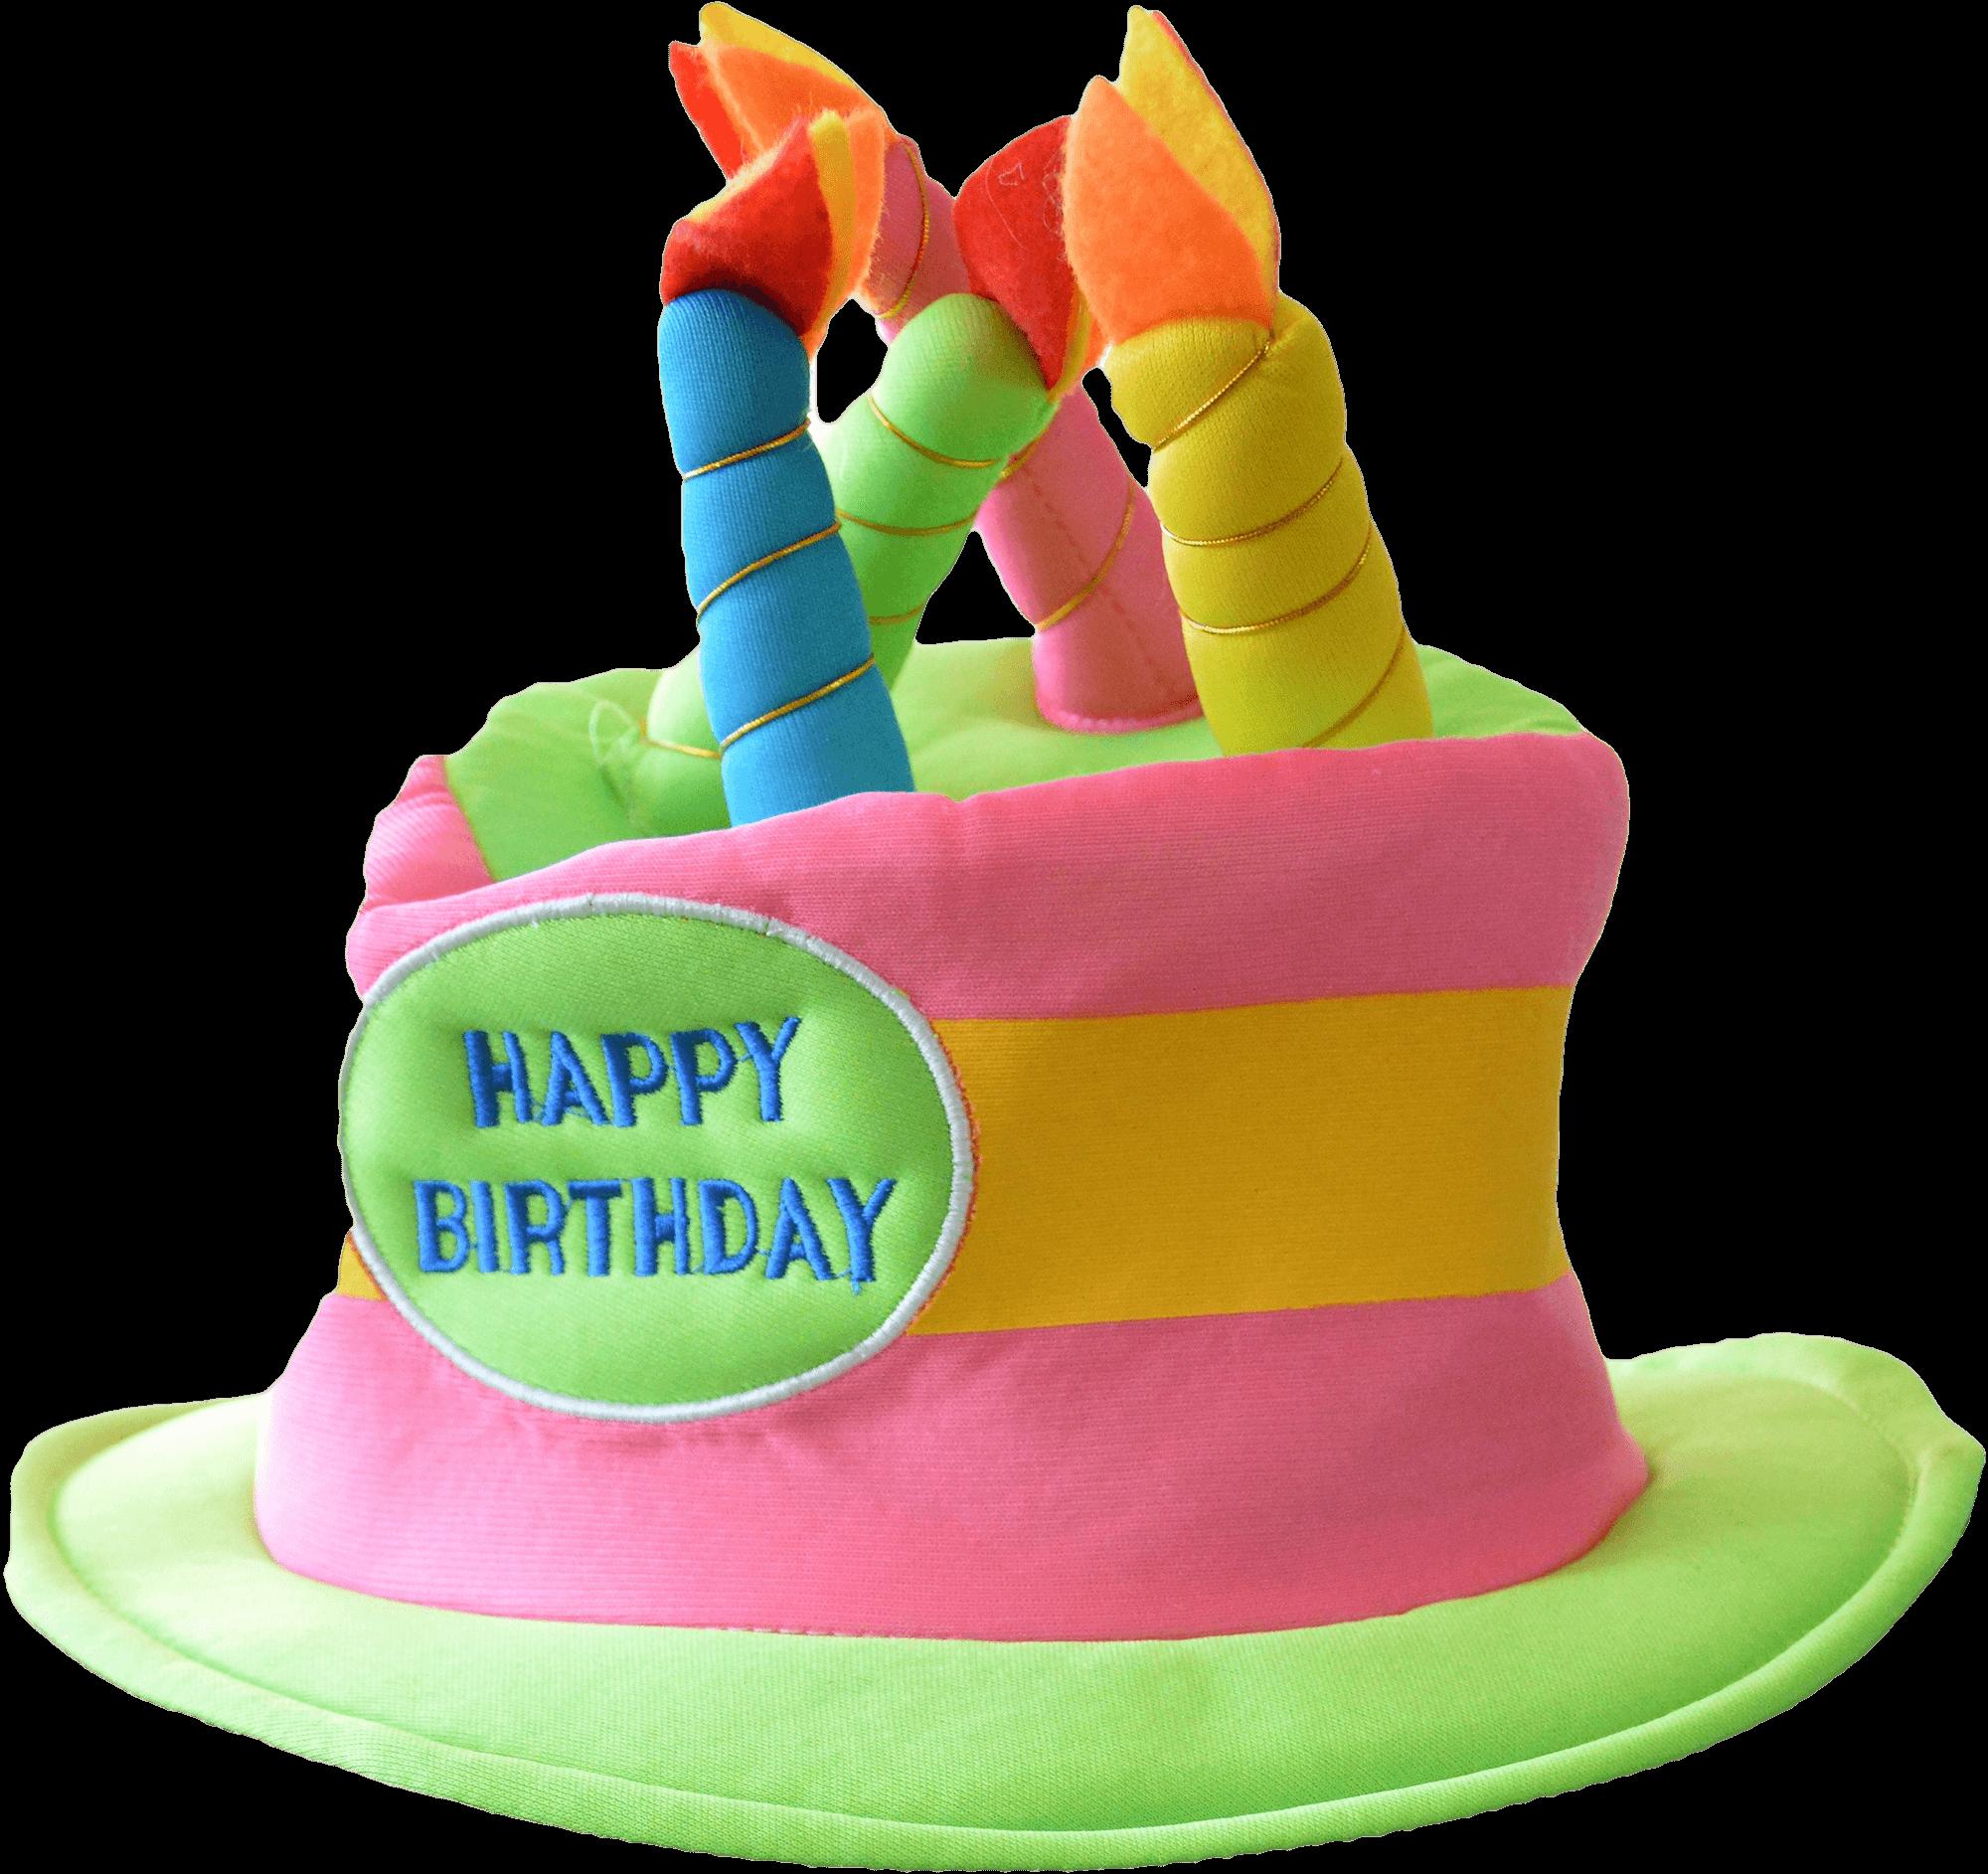 2000x1885 Happy Birthday Hat Transparent Png